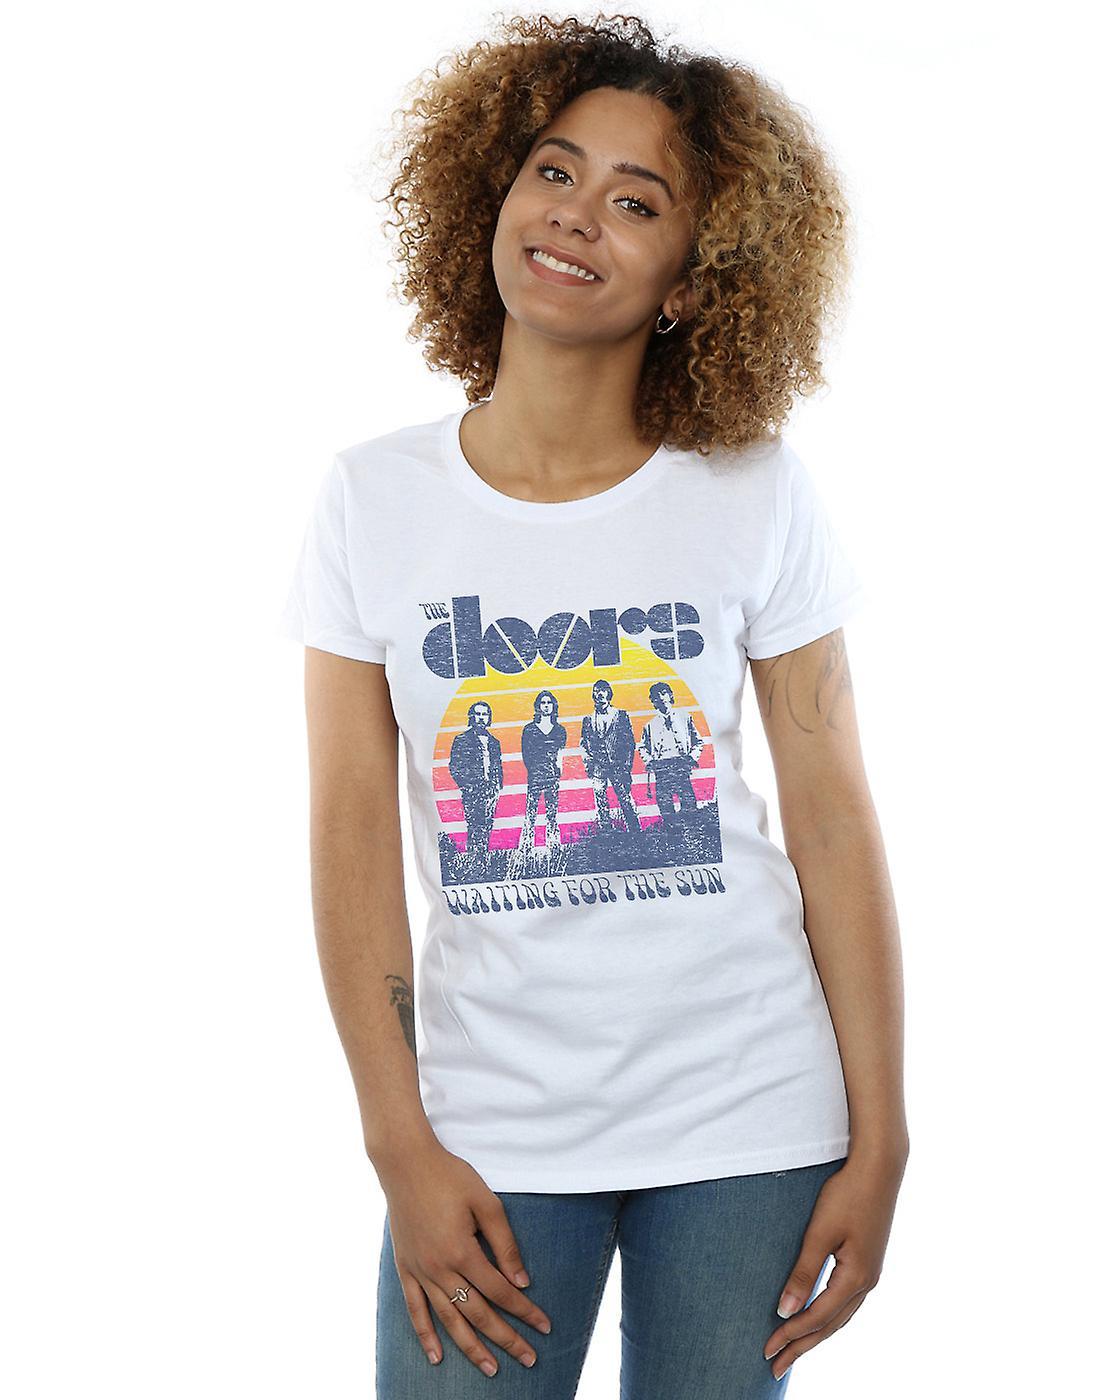 The Doors Women's Waiting For The Sun Band T-Shirt